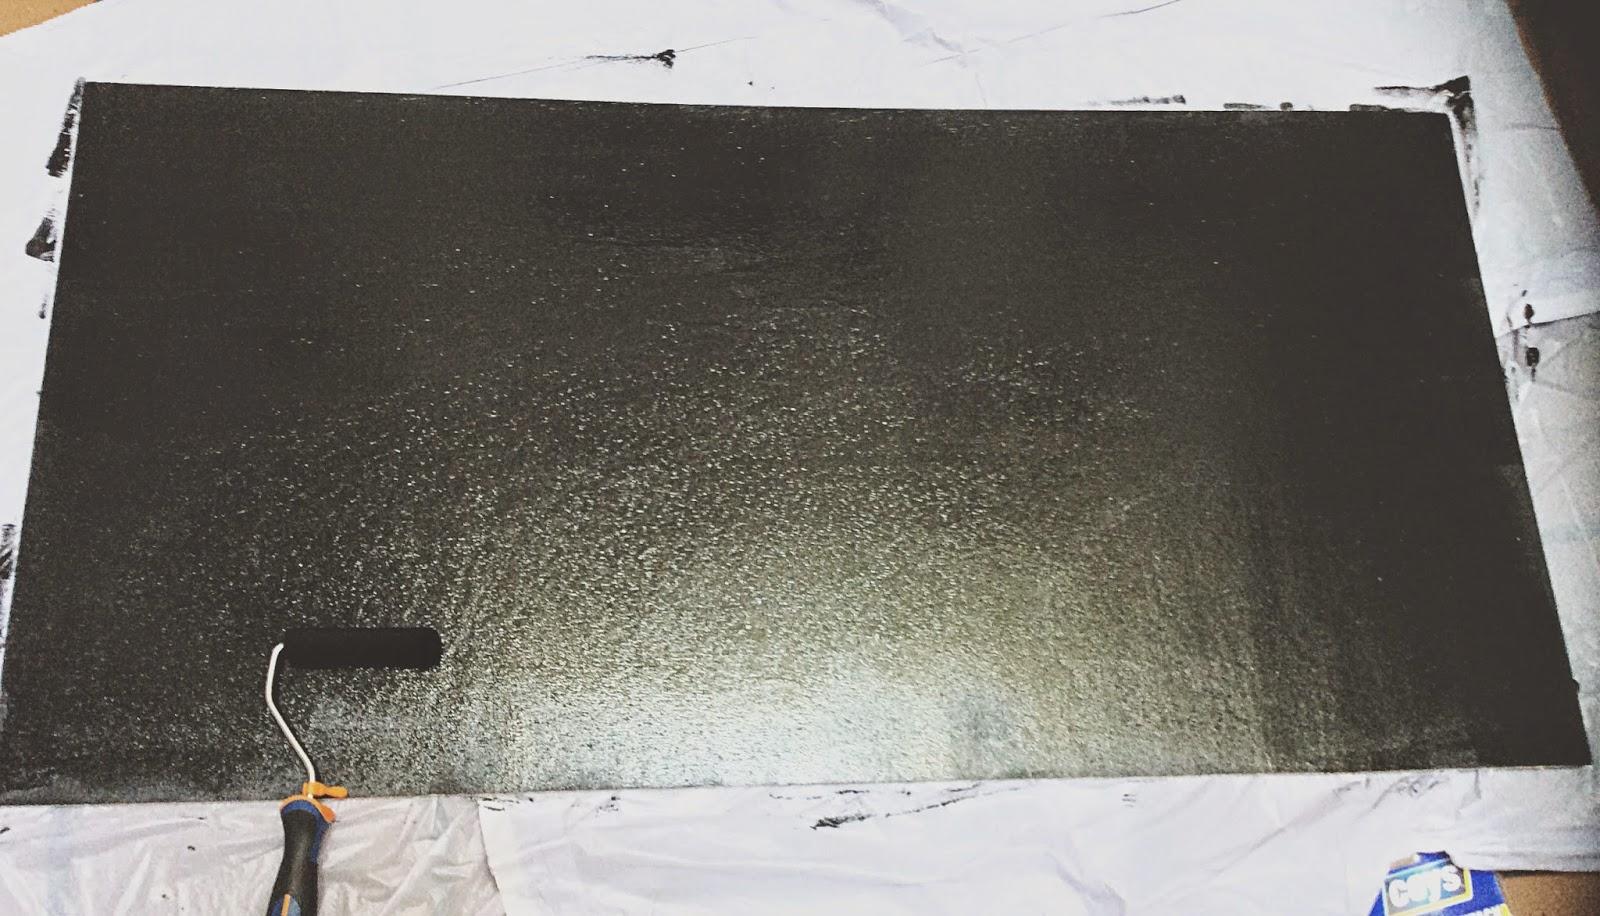 Pintura pizarra negra pintura ideal para pared pizarra - Pintura pizarra rotulador ...